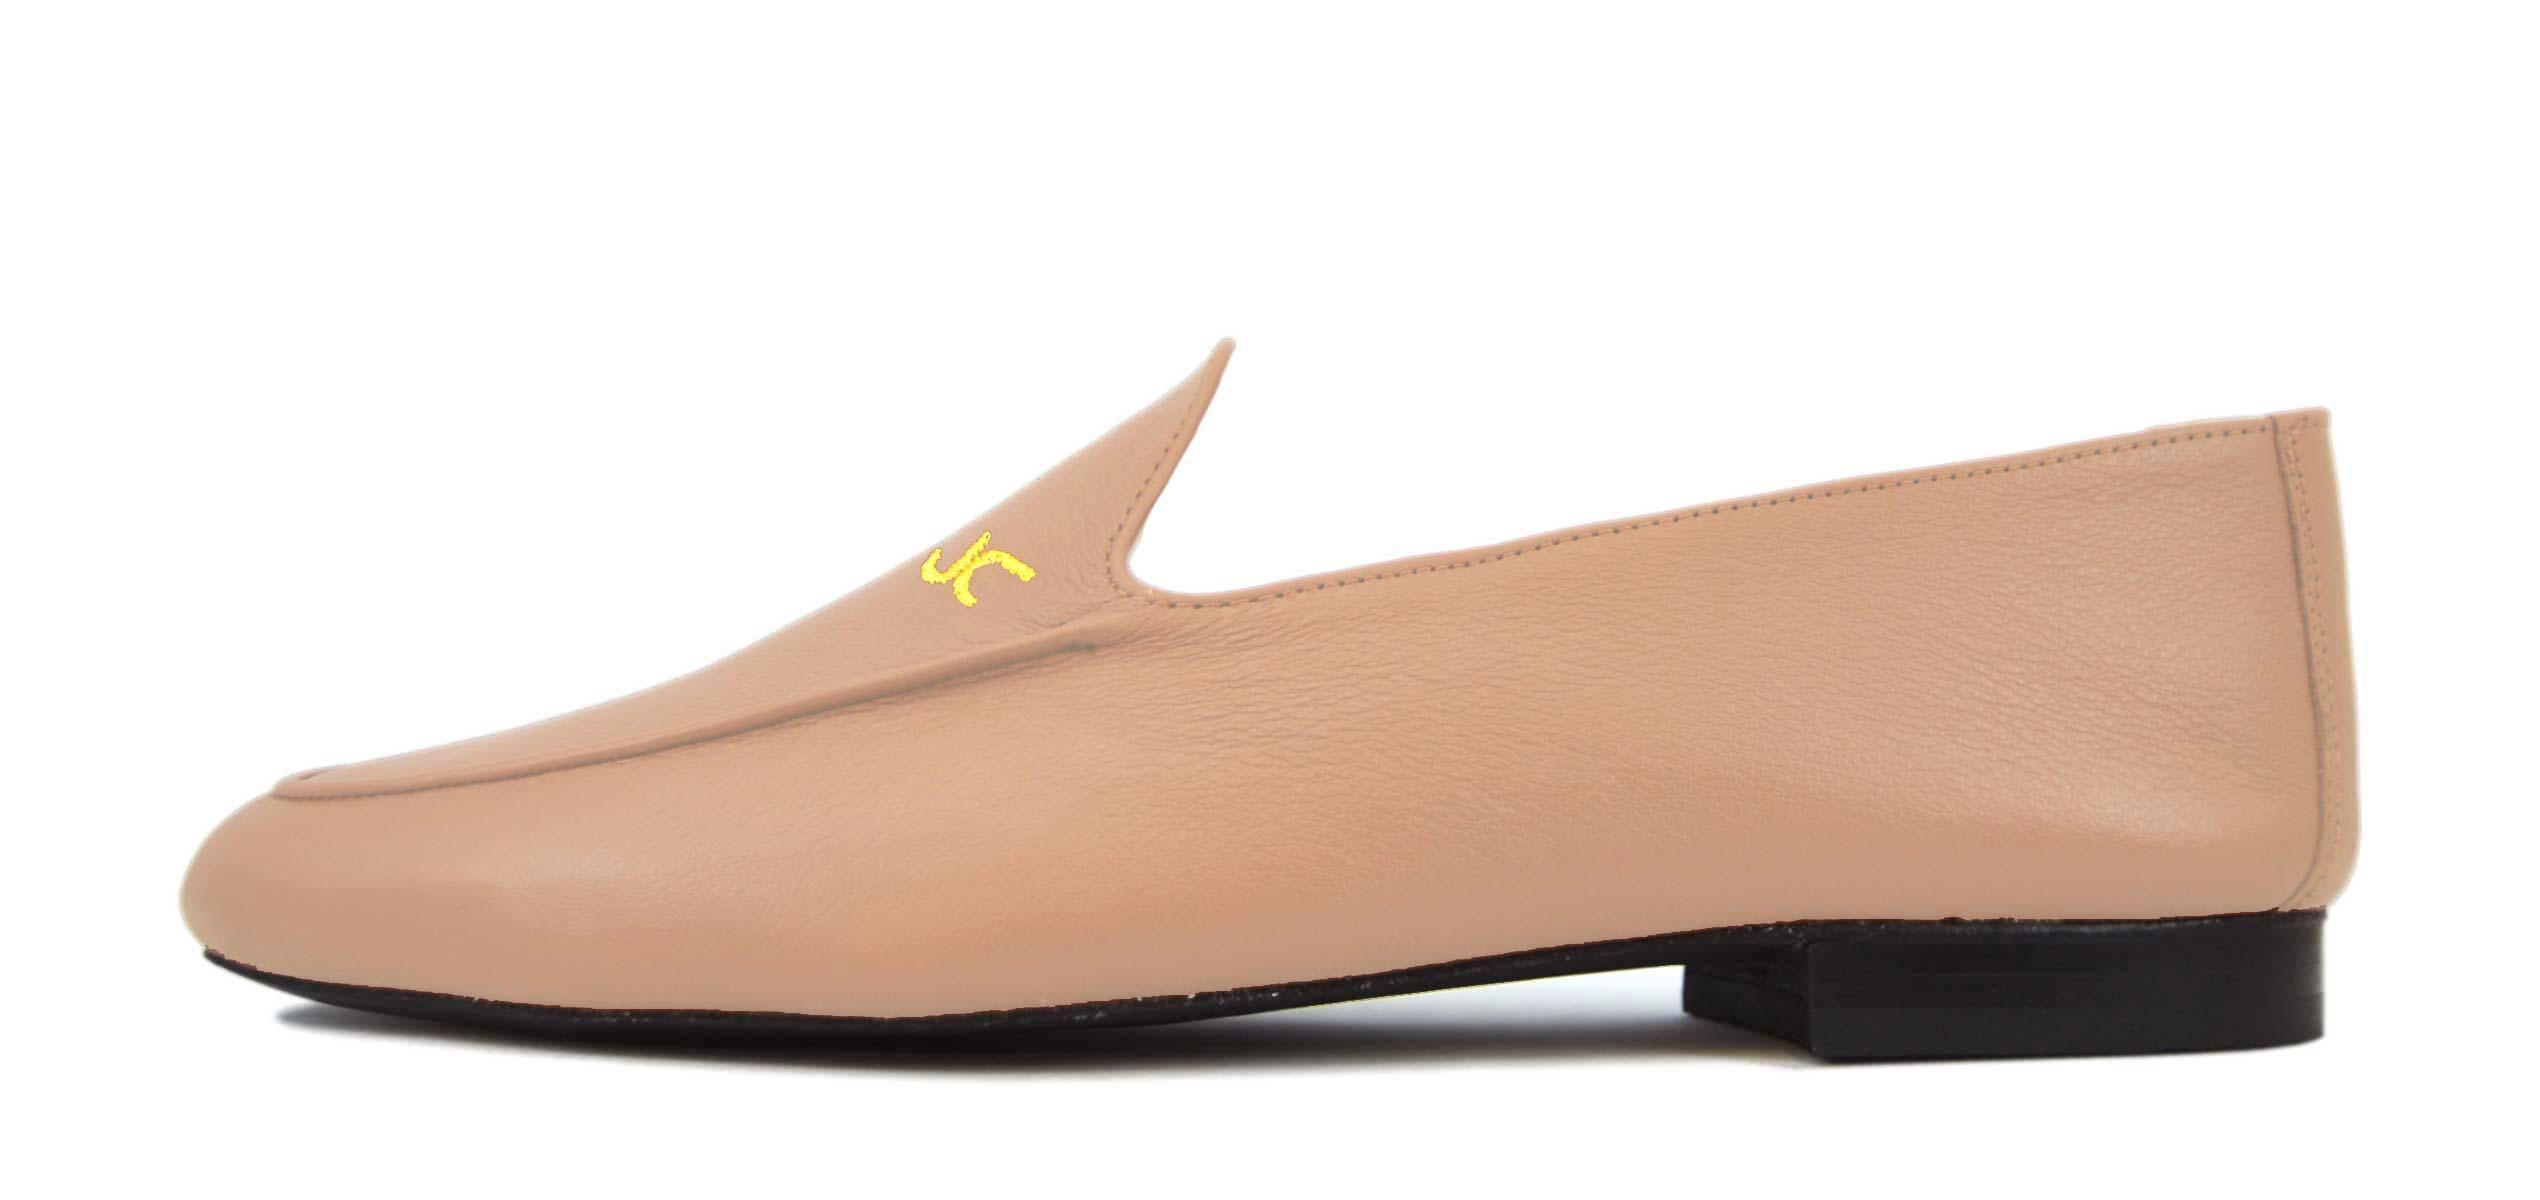 Foto 1 de Zapatos Julio Iglesias 528 JC Pink Napa Piel Original